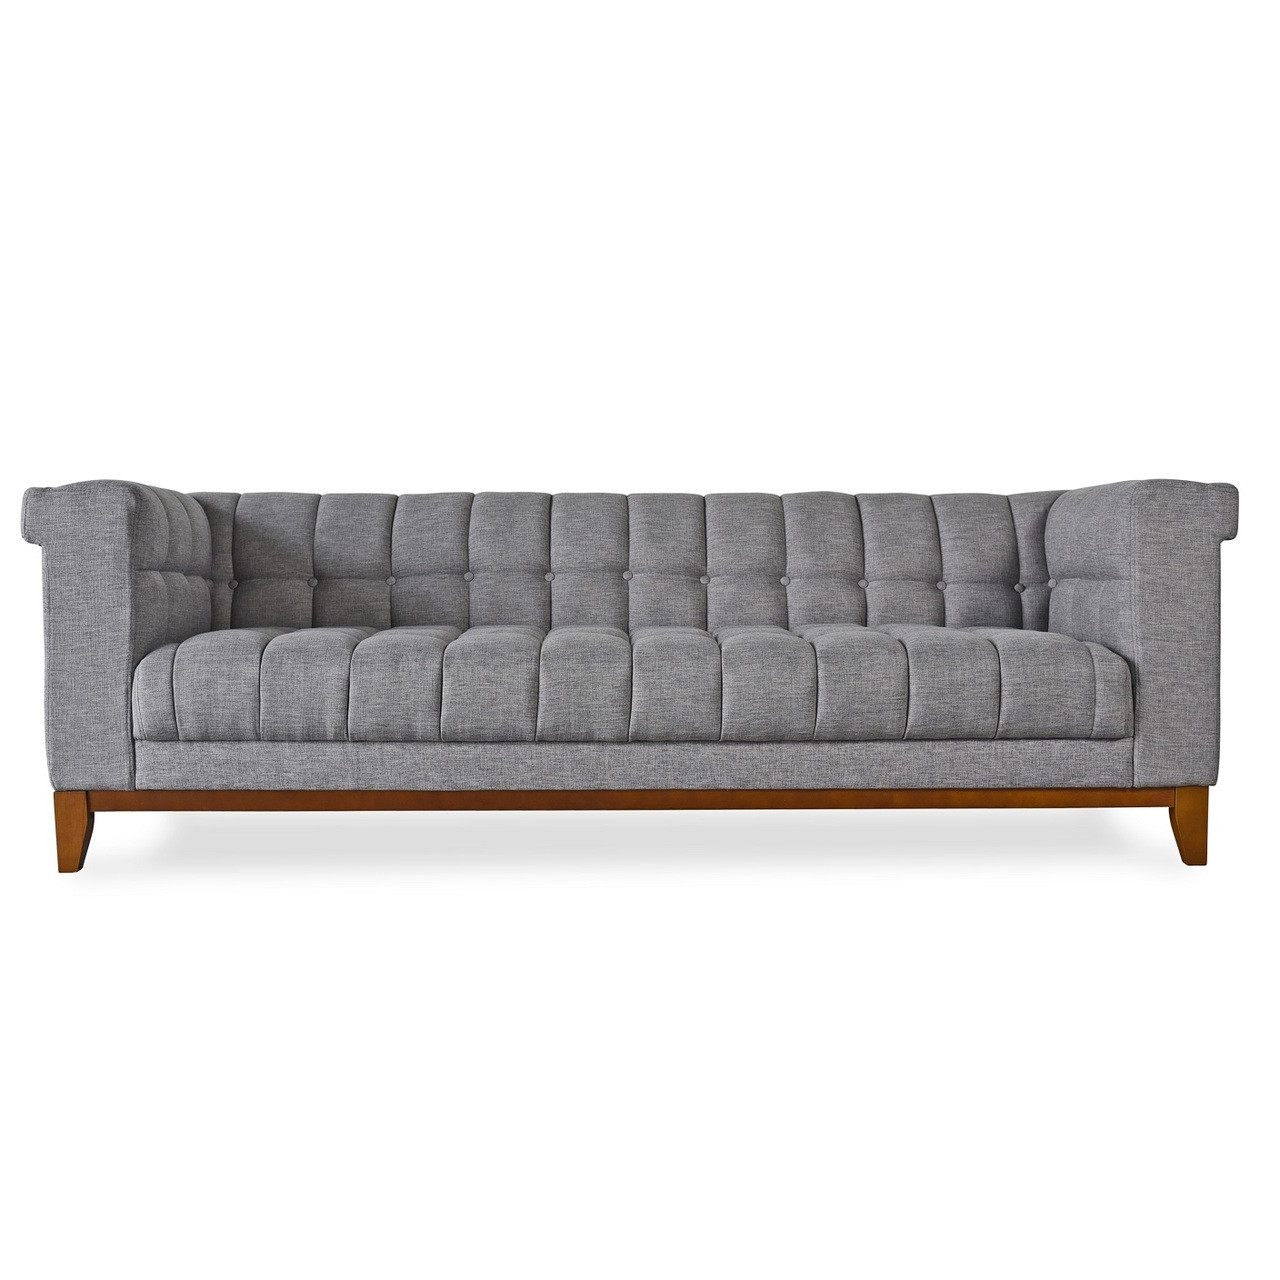 gray linen tufted sofa slipcovers queen anne nest modern grey zin home